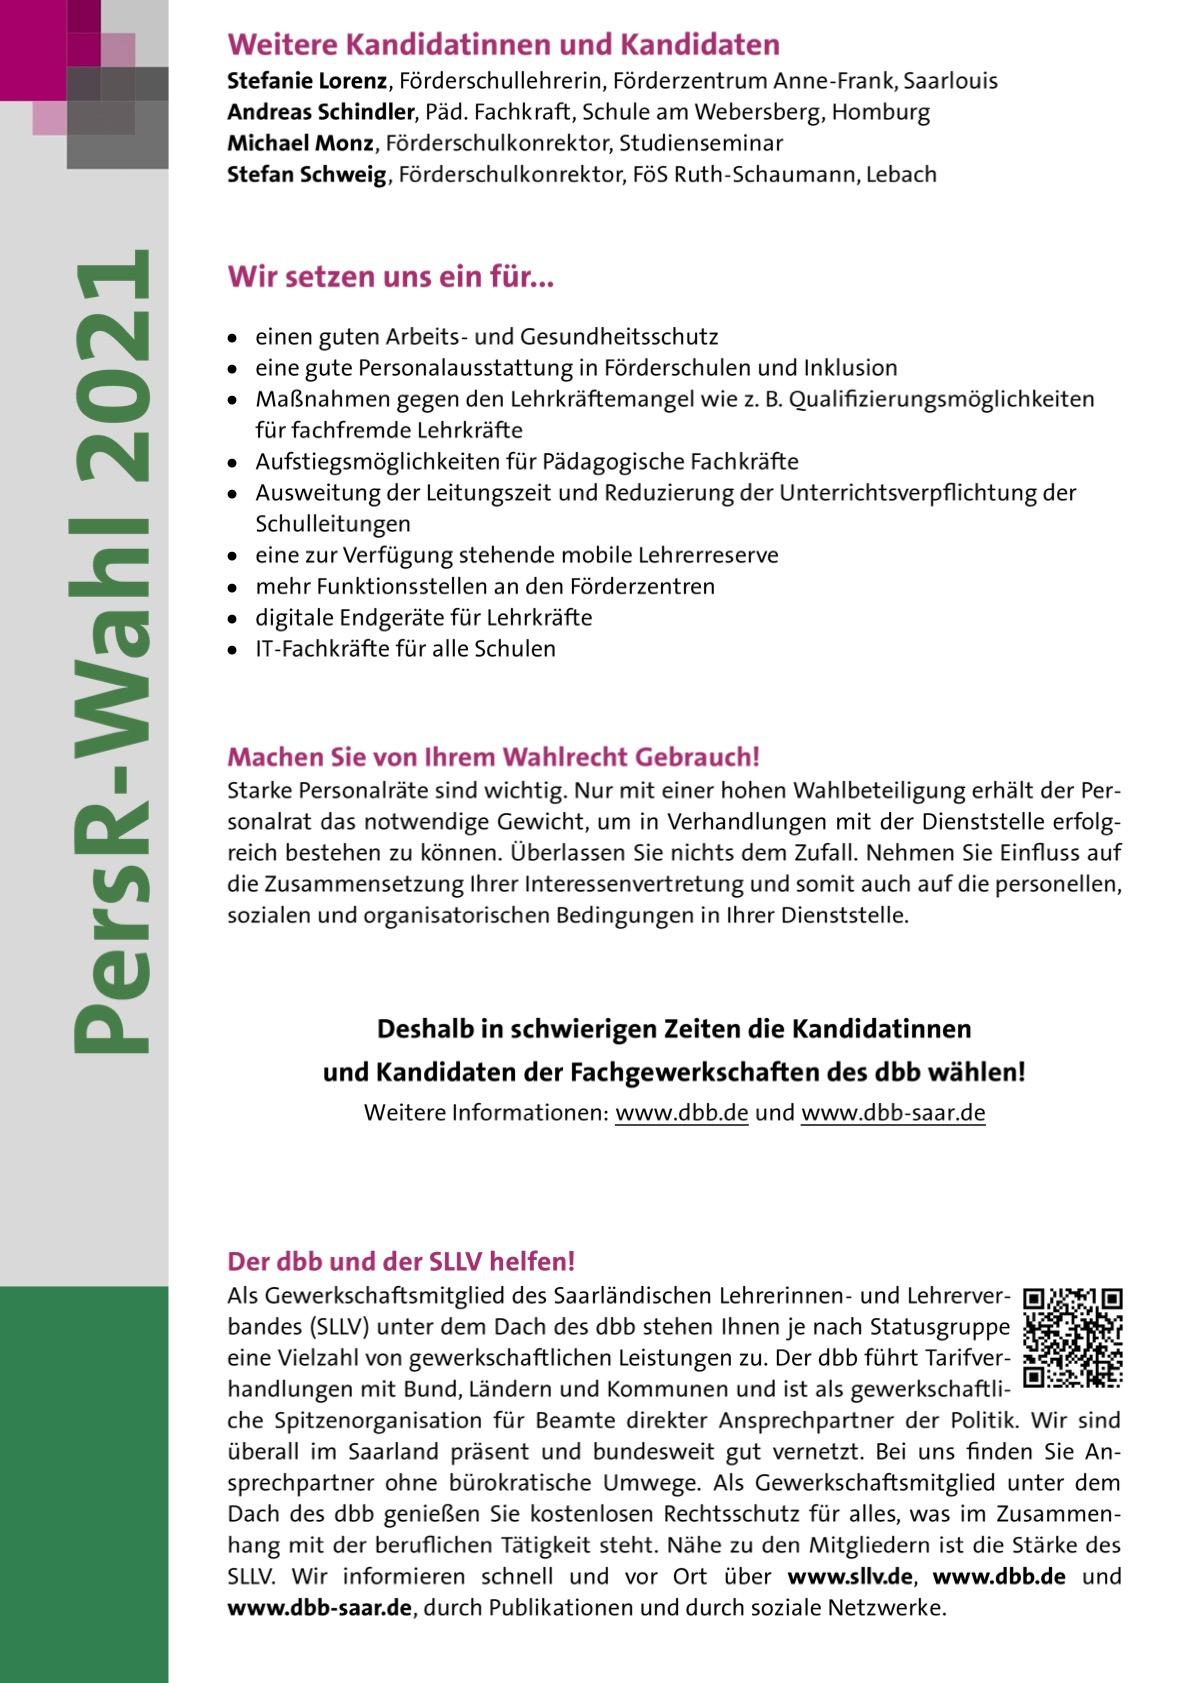 23_SLLV_HPR-Frderschule_Flugblatt_PersR_Wahl_02